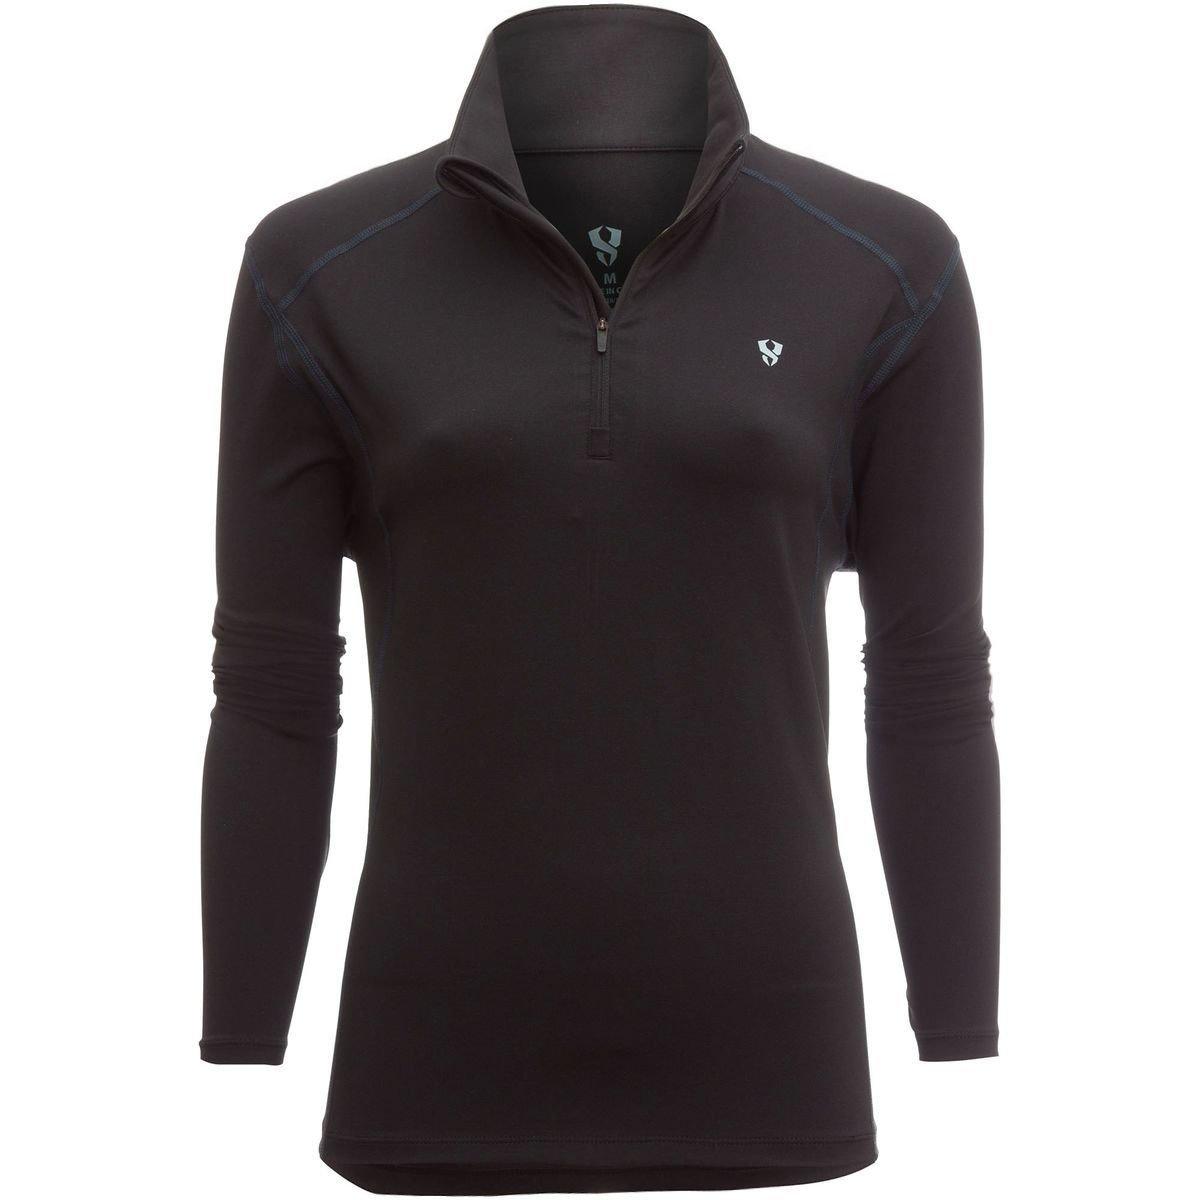 CLIMATESMART Mens Comfortwear Long Sleeve 1//4 Zip Midweight Baselayer Top